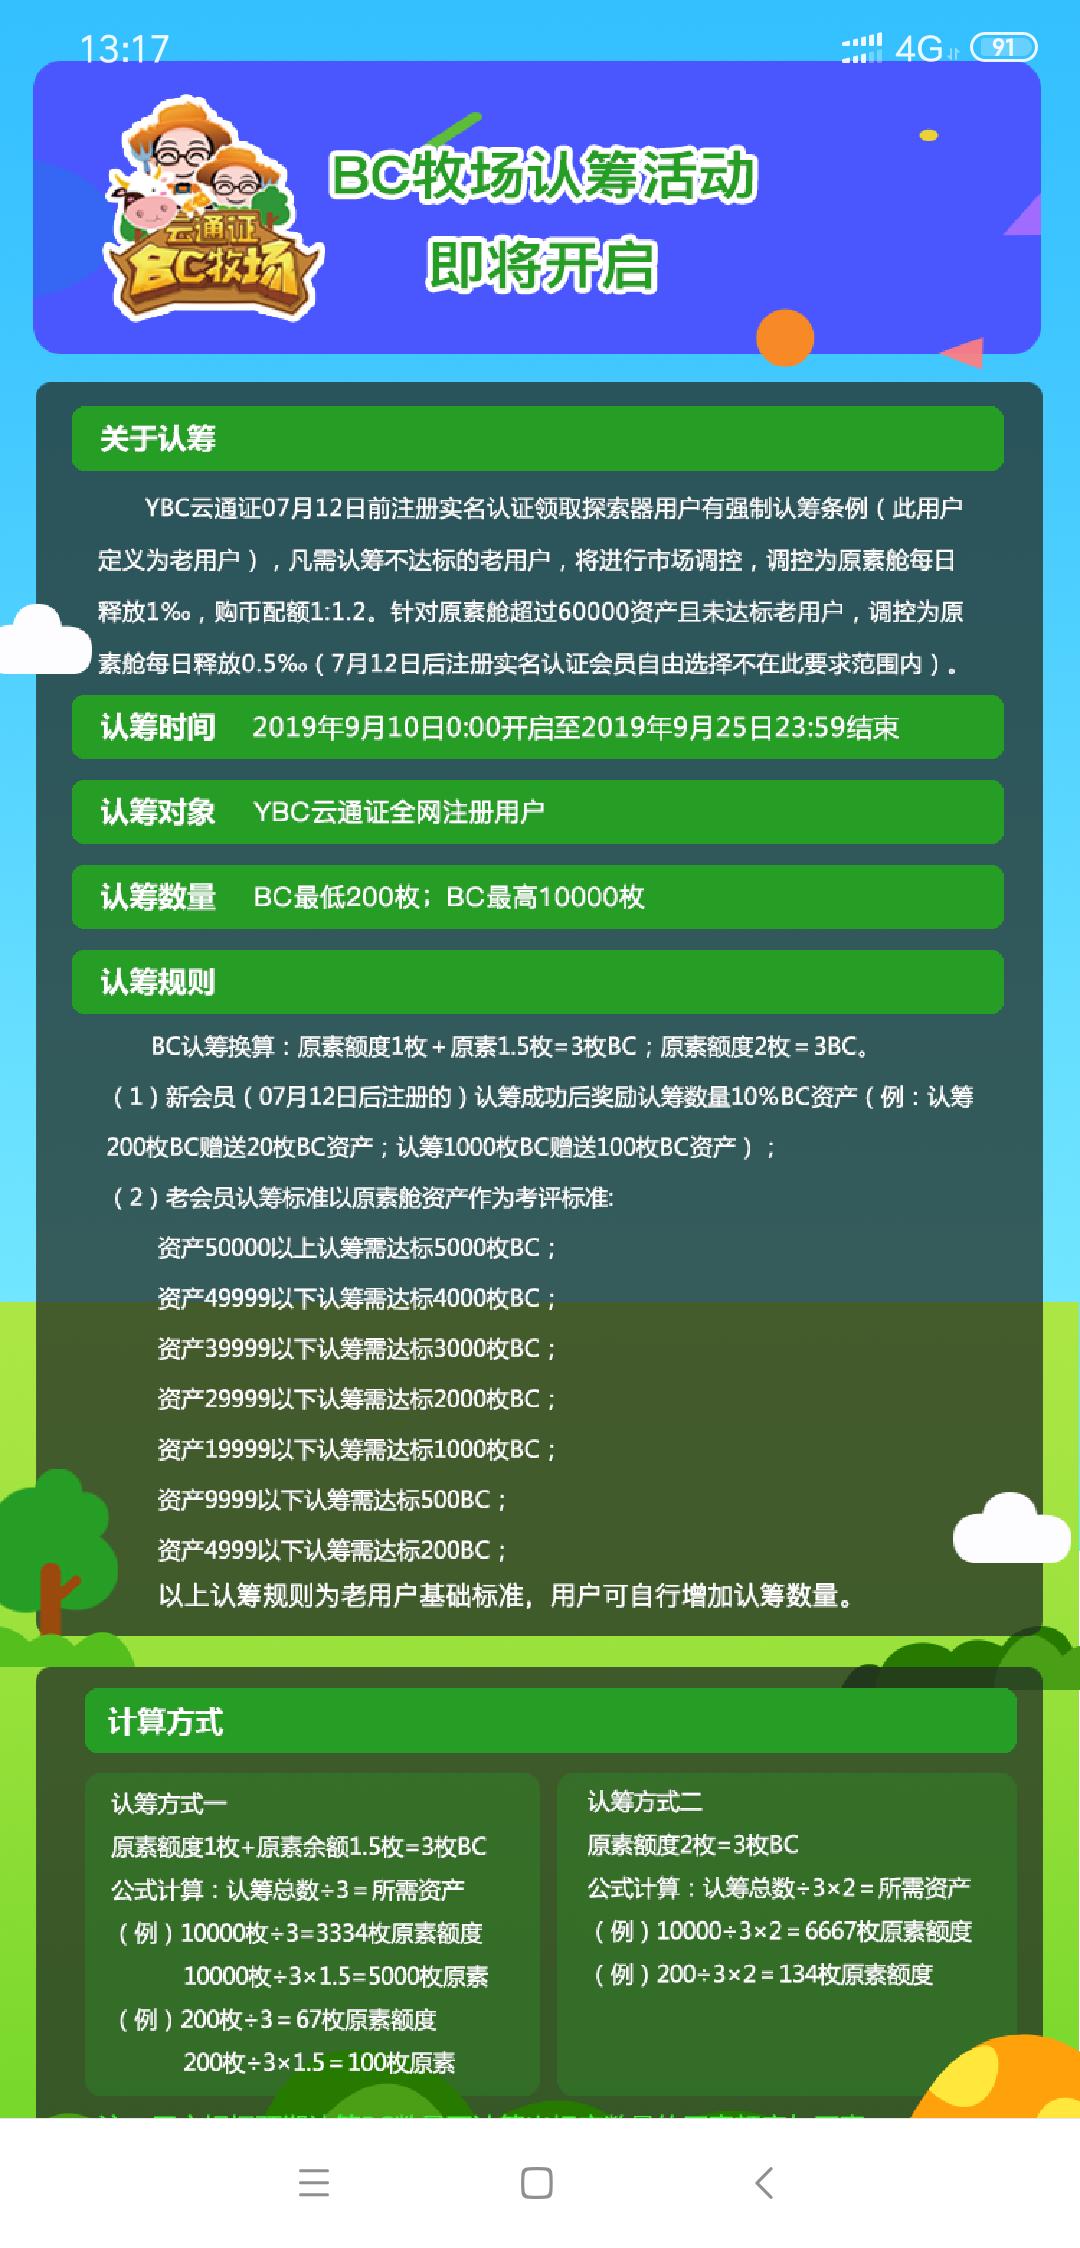 YBC云通证